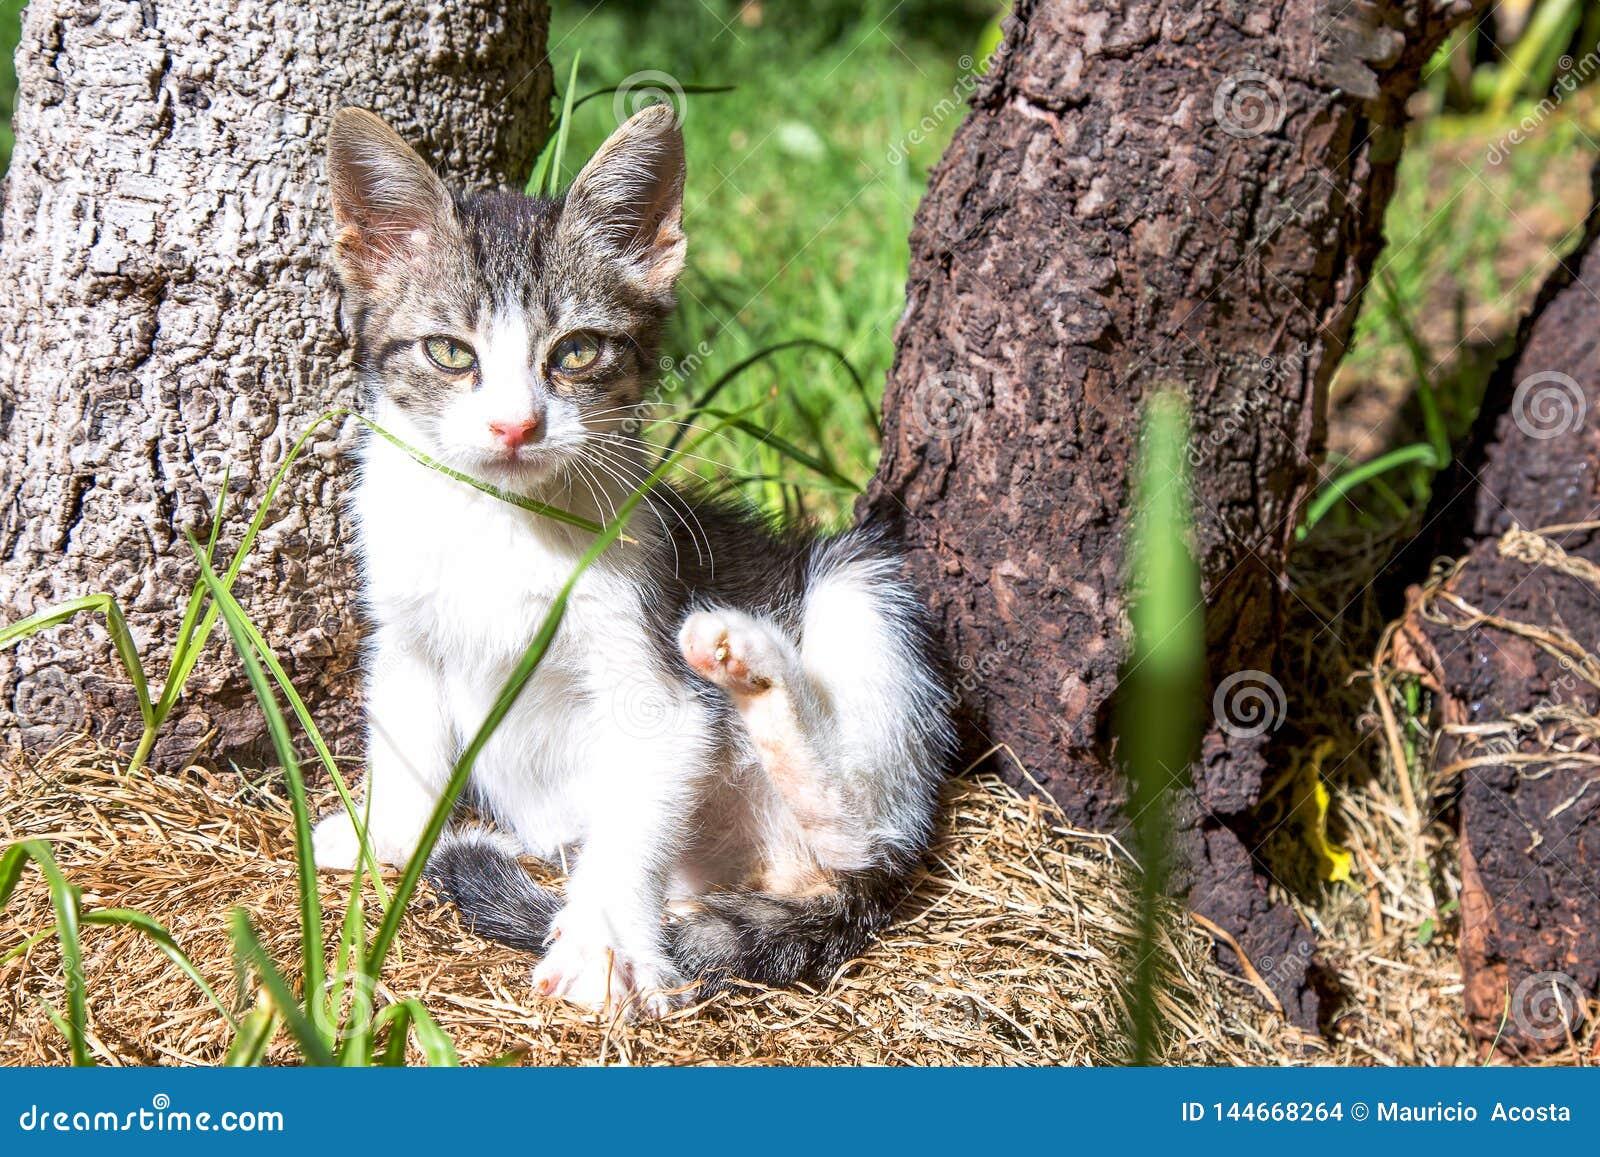 Kitten trying to scratch itself